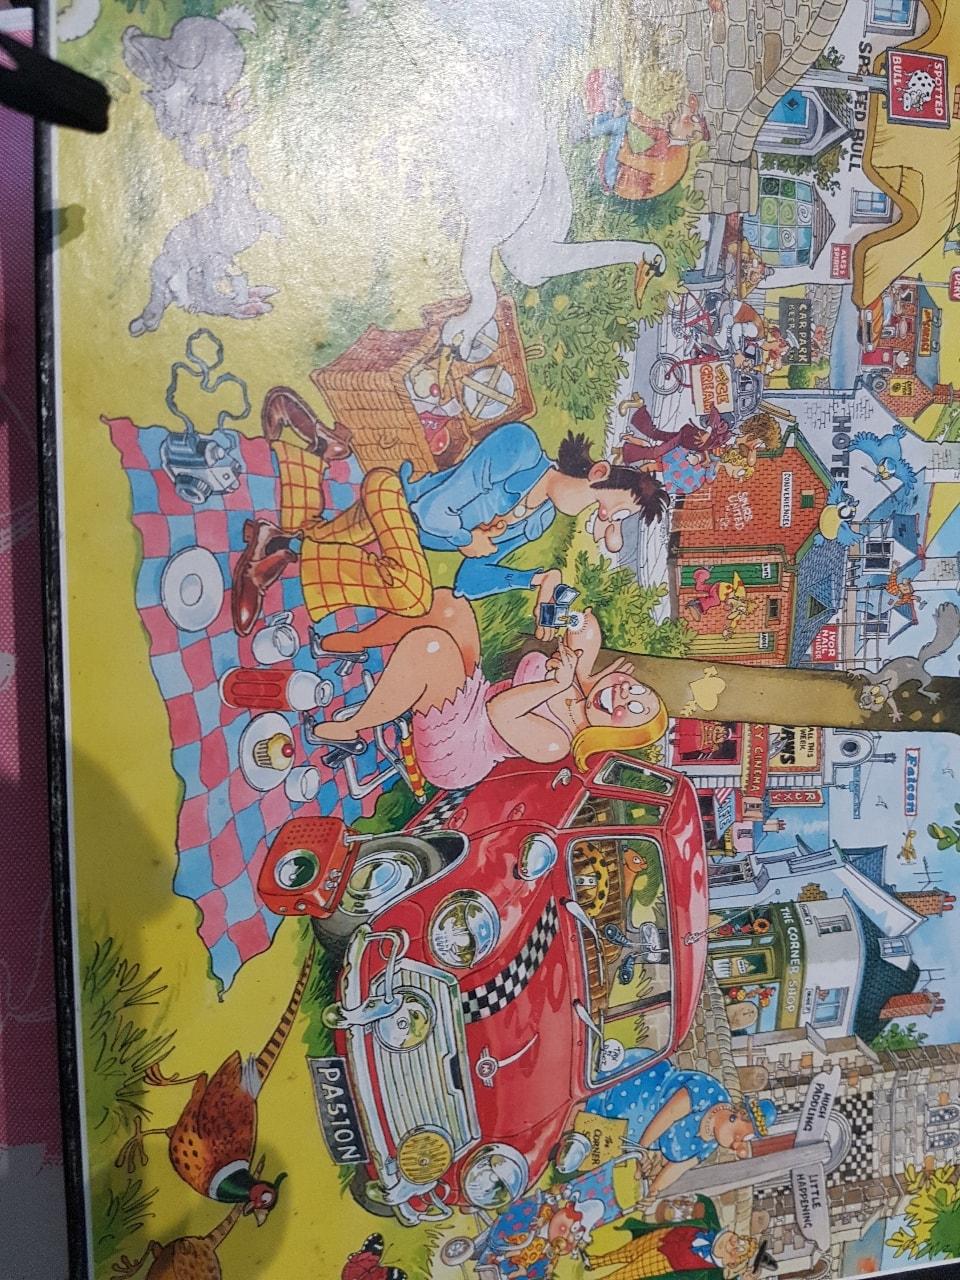 Jigsaw picnic